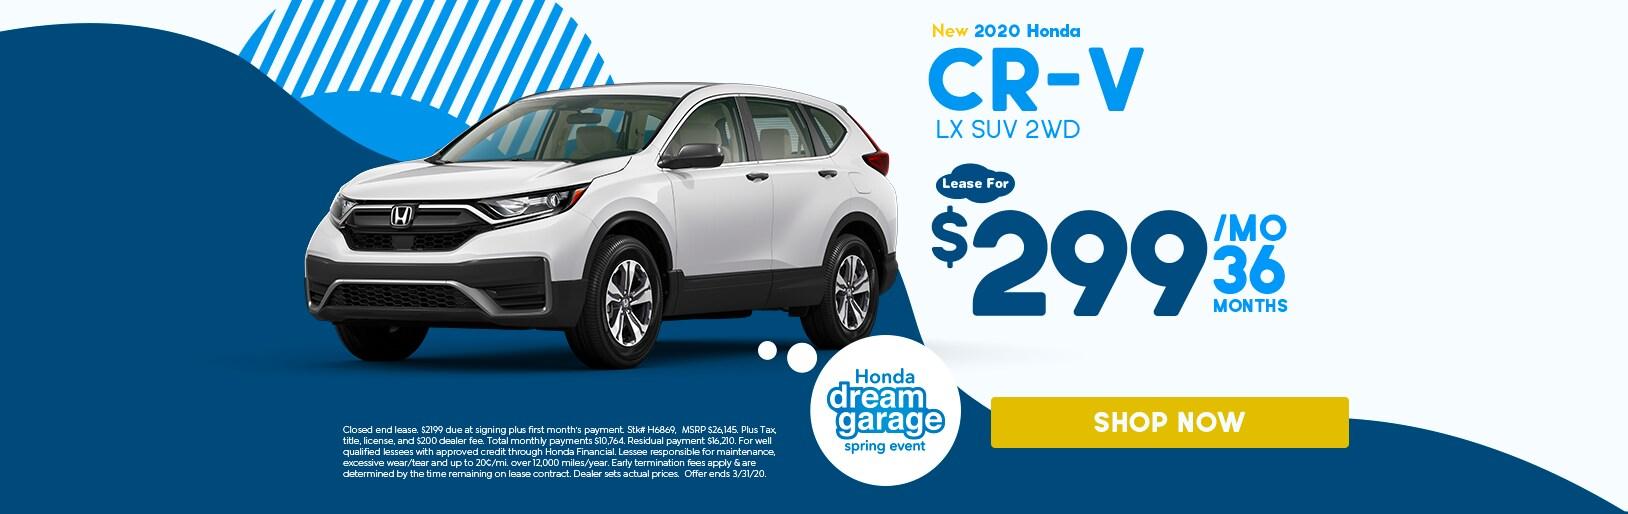 Honda Dream Garage Spring Event in Monroe, LA